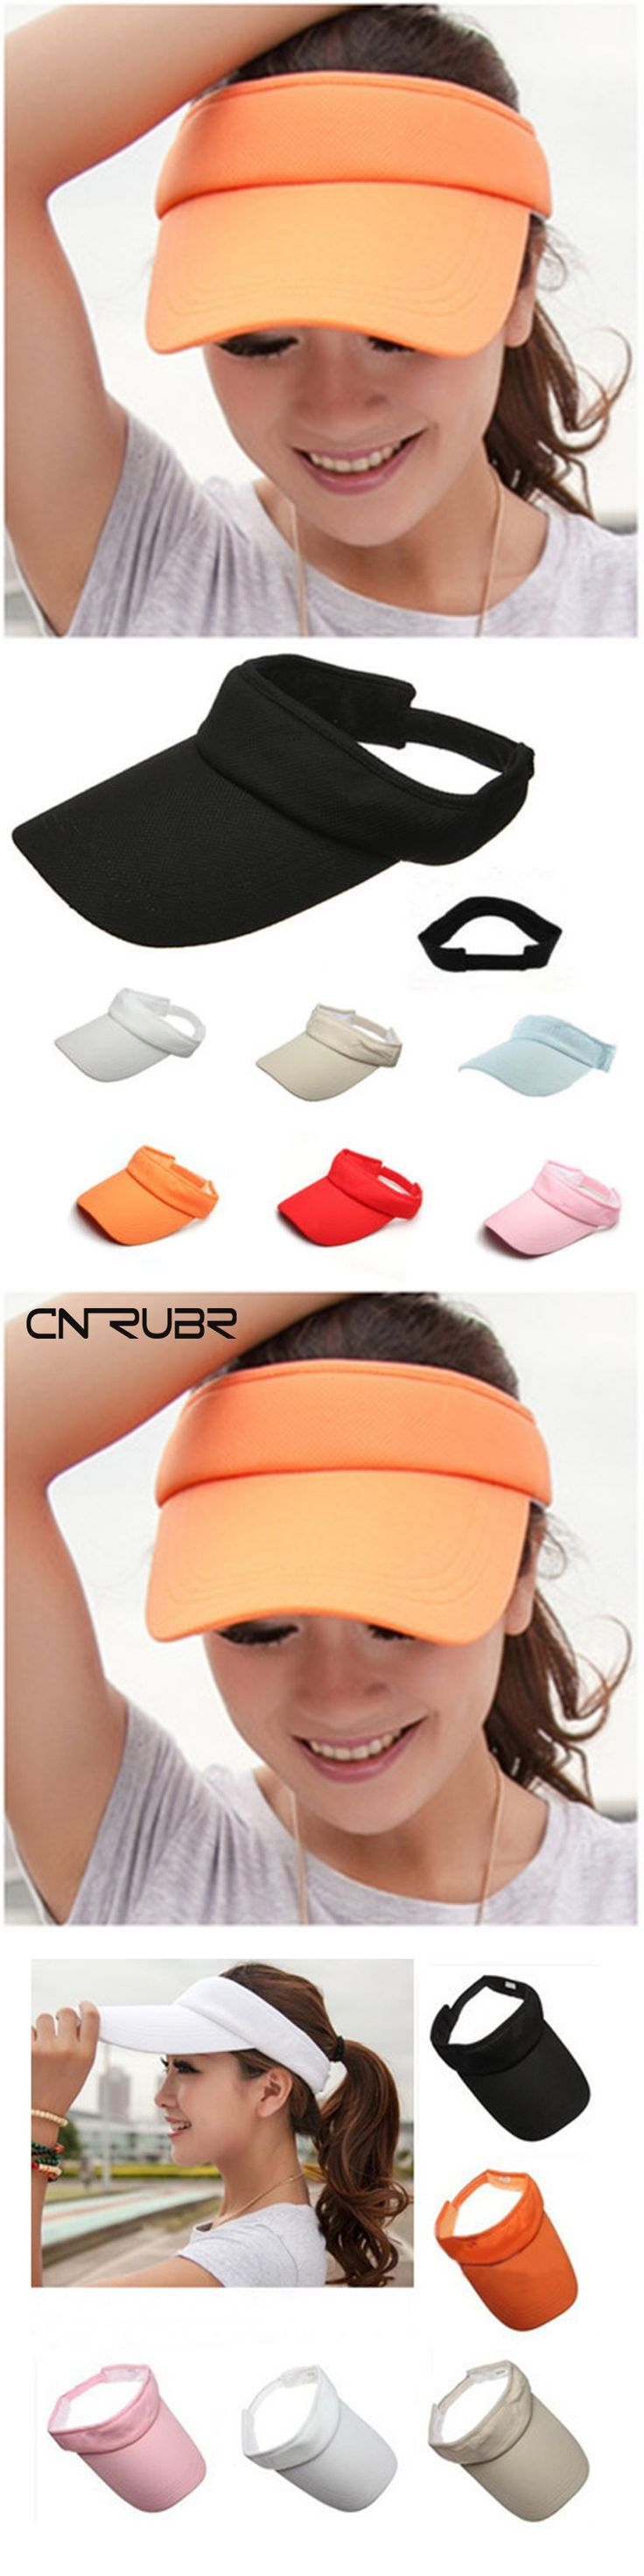 CN-RUBR 2016 New Hot Selling Tennis Caps Stylish Women Men Unisex  Beach Sun Visor Hat  Baseball Tennis Adjustable